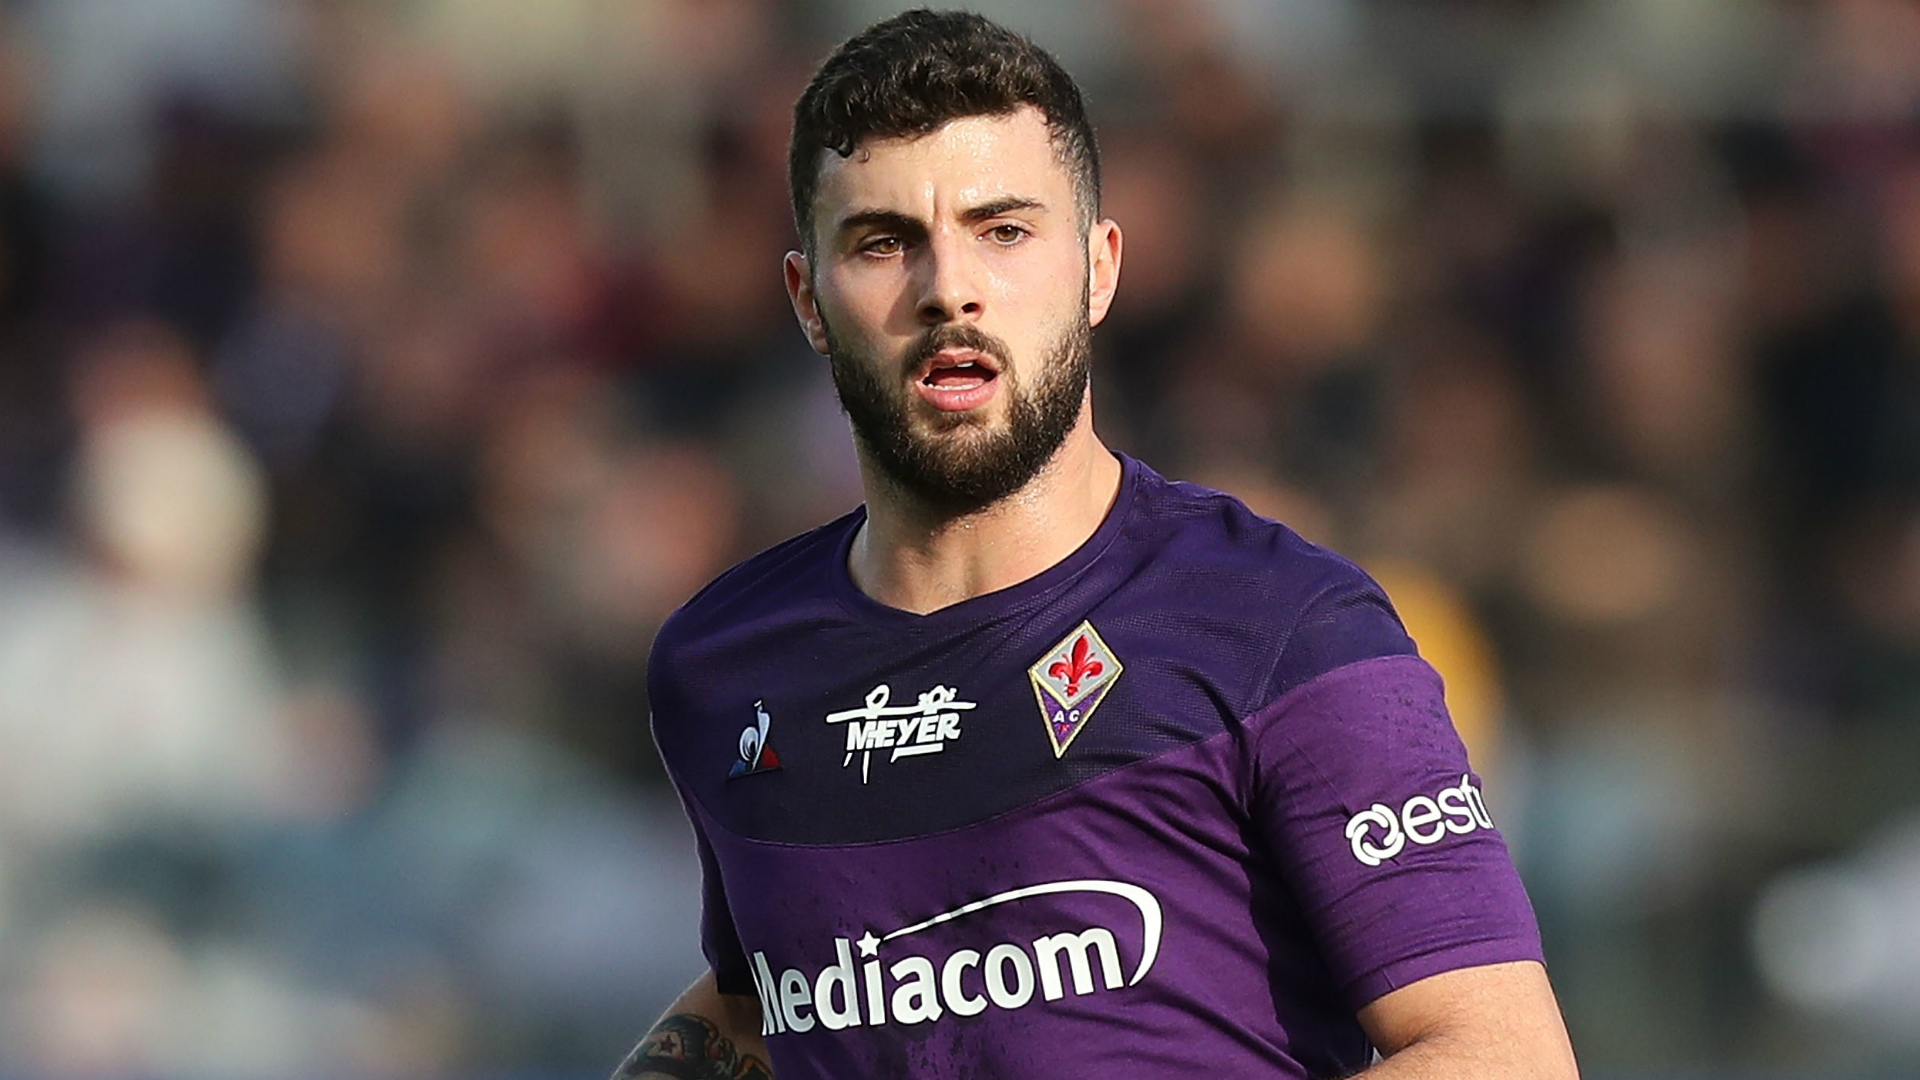 Fiorentina players Cutrone, Pezzella catch Coronavirus